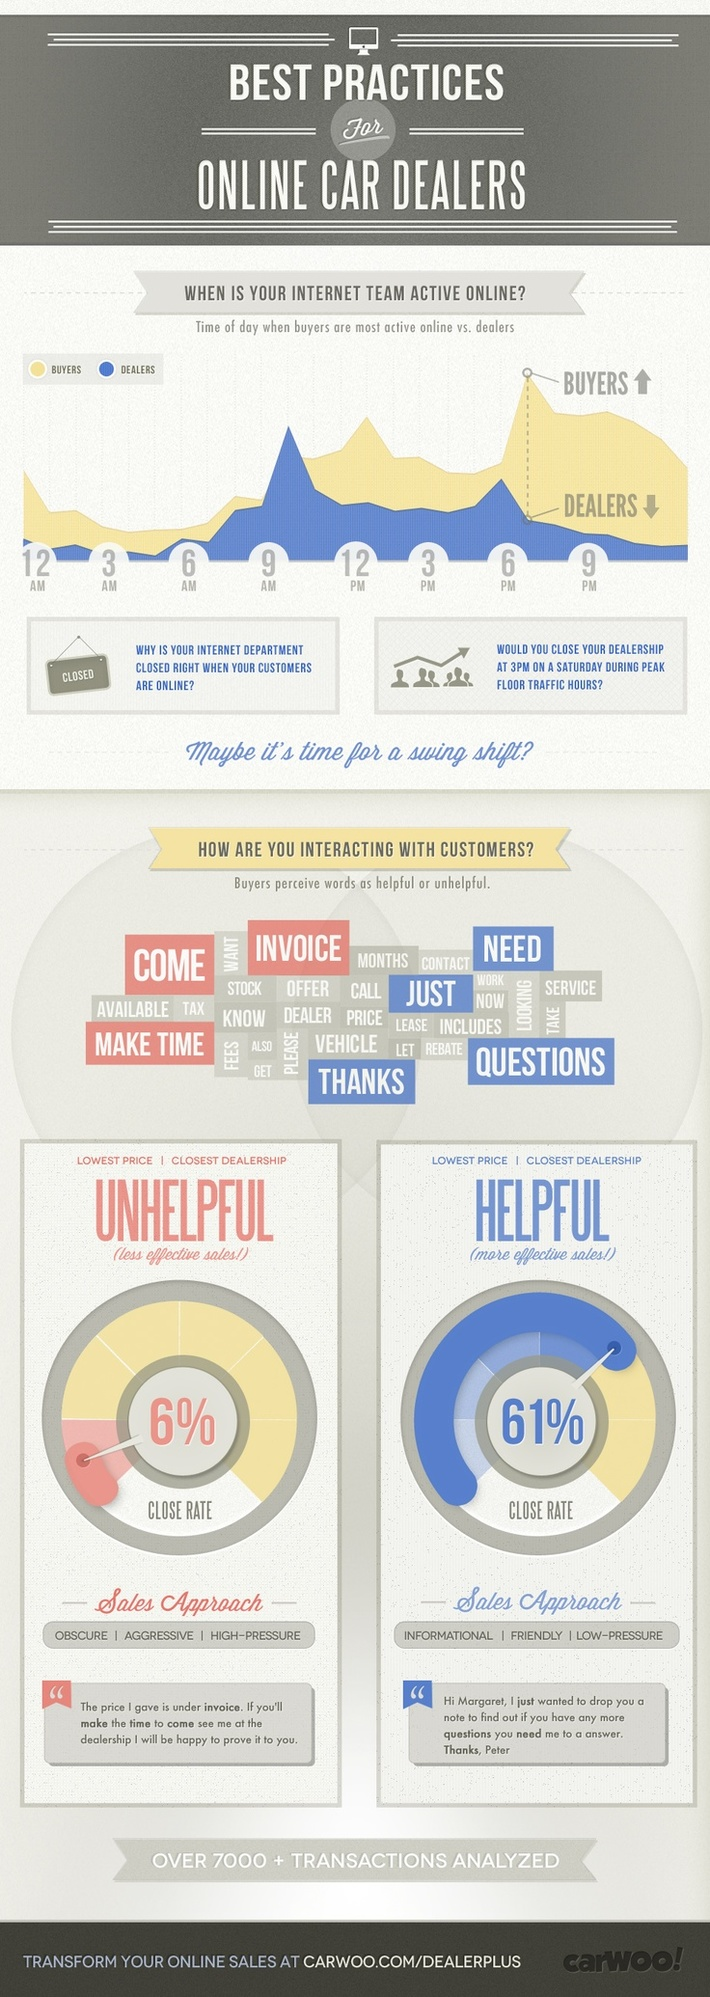 Car Dealer Online Best Practices Infographic